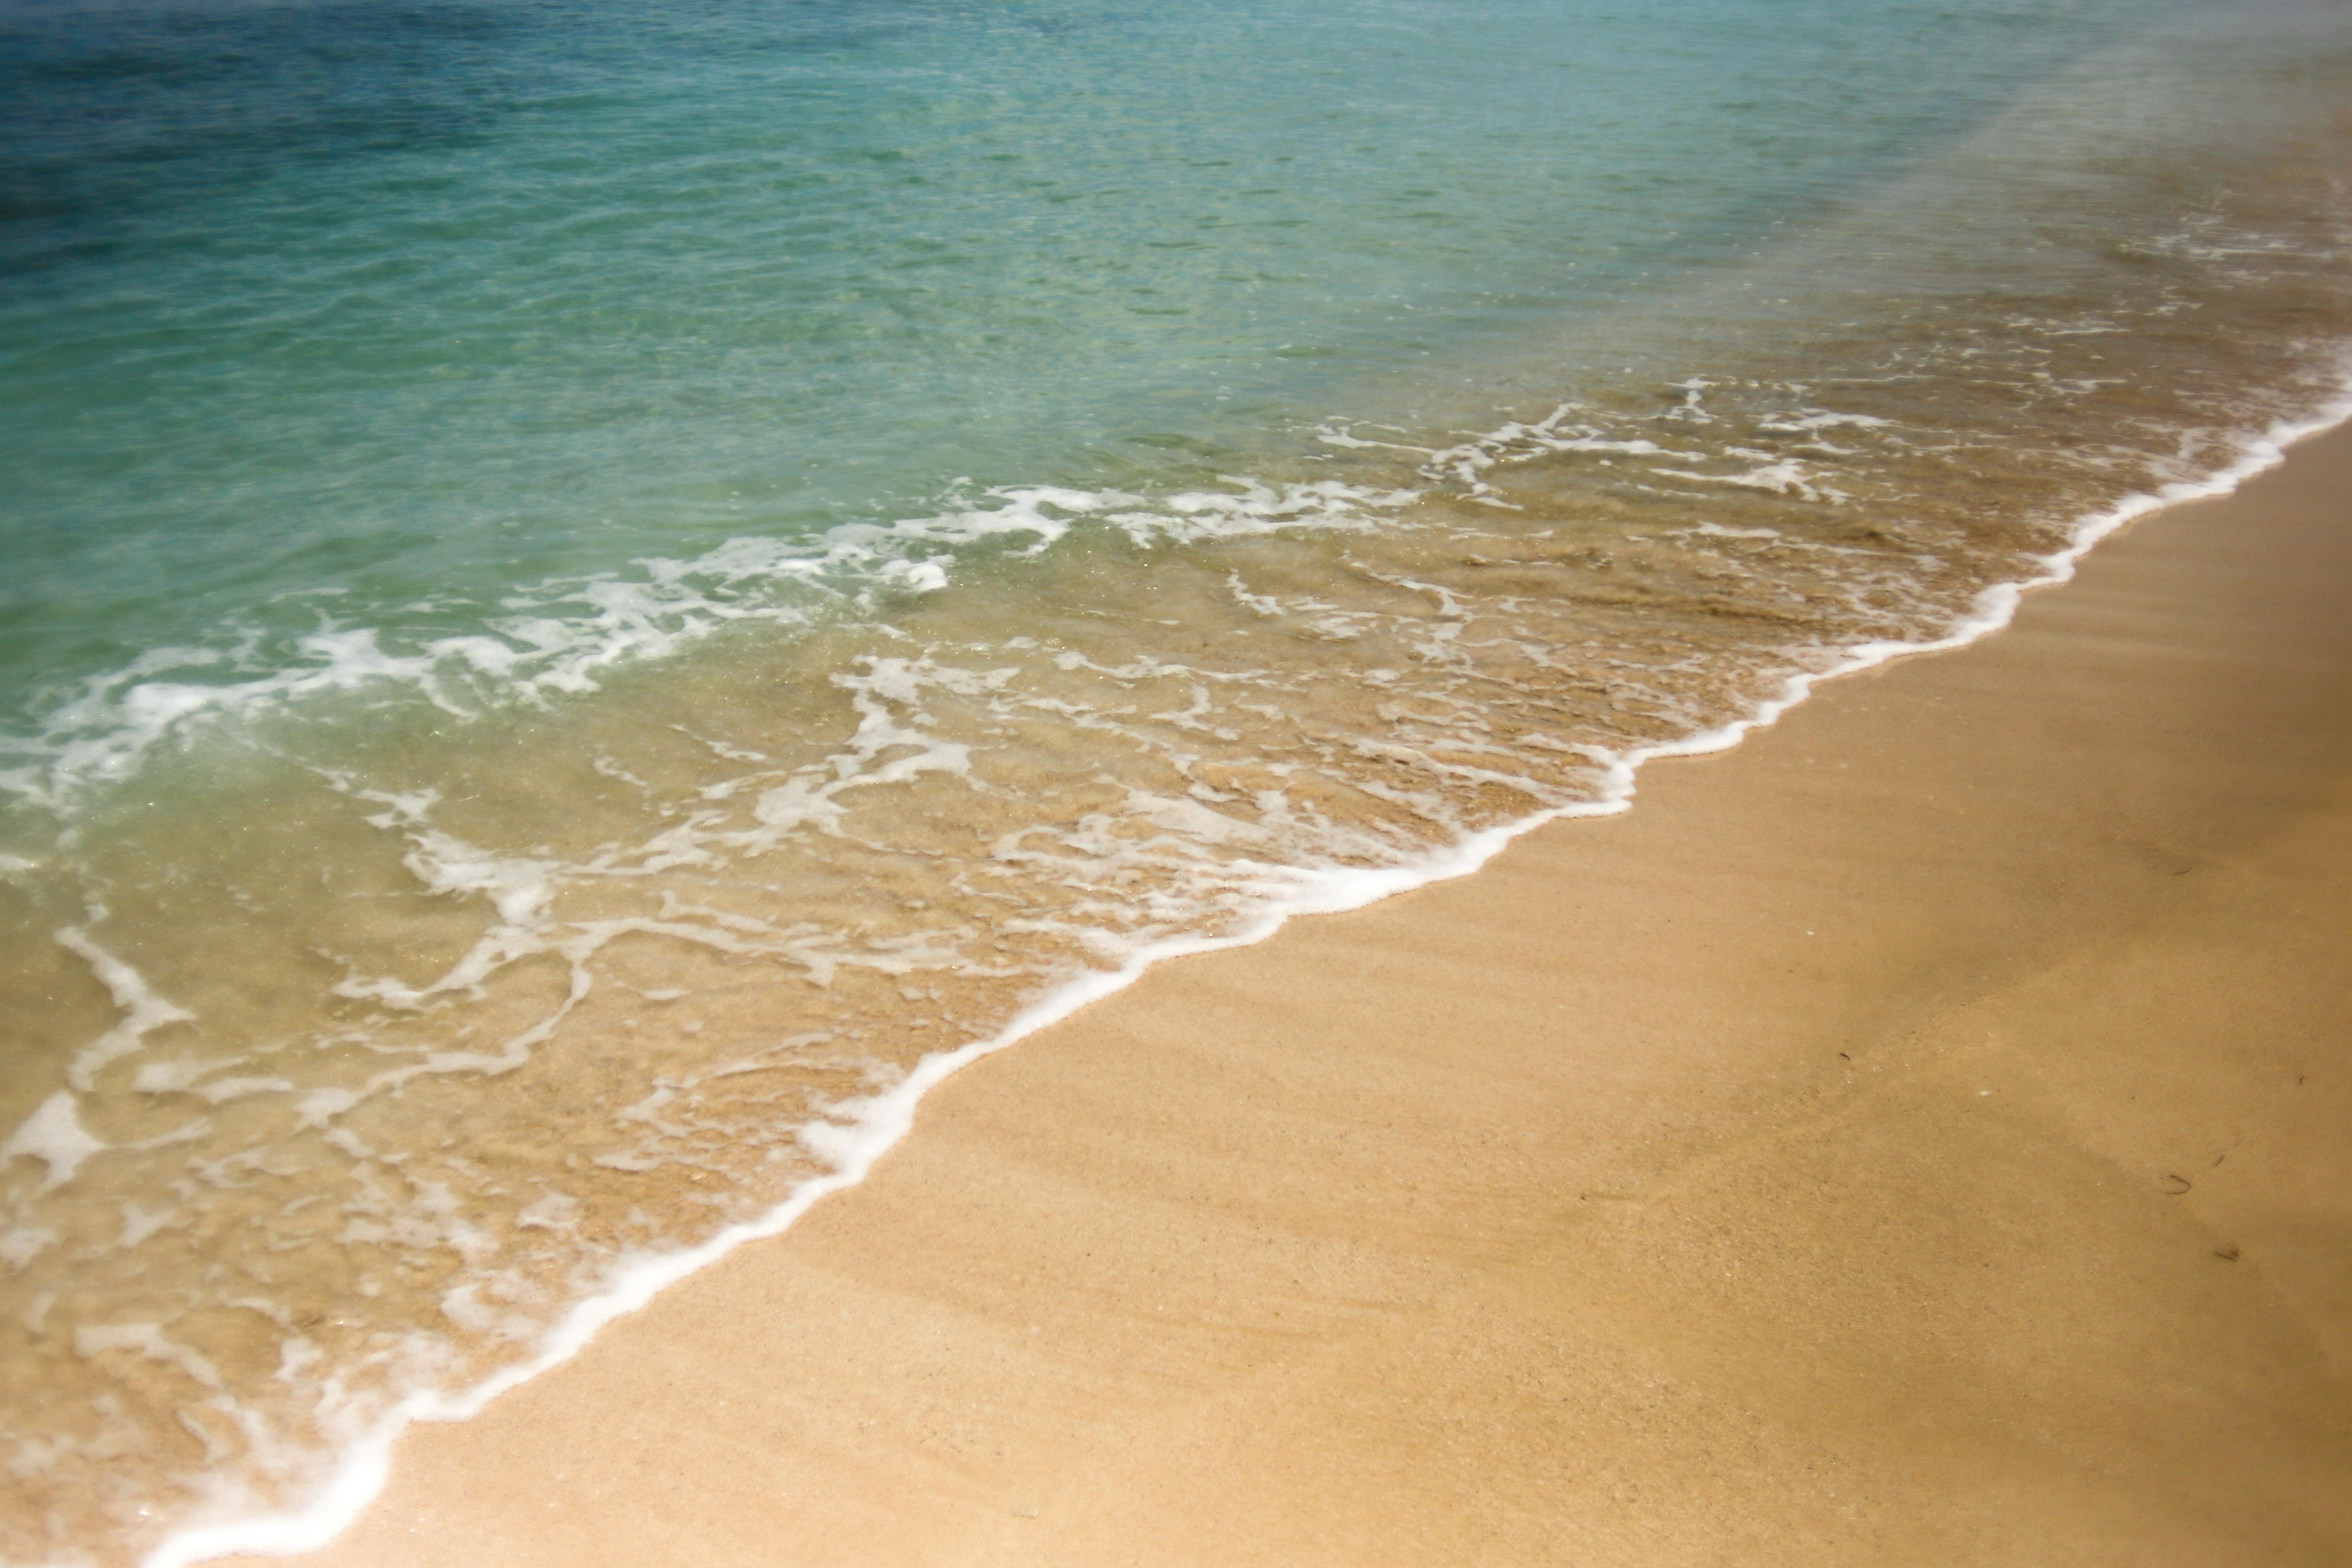 Clear ocean washing on the fine sand beach